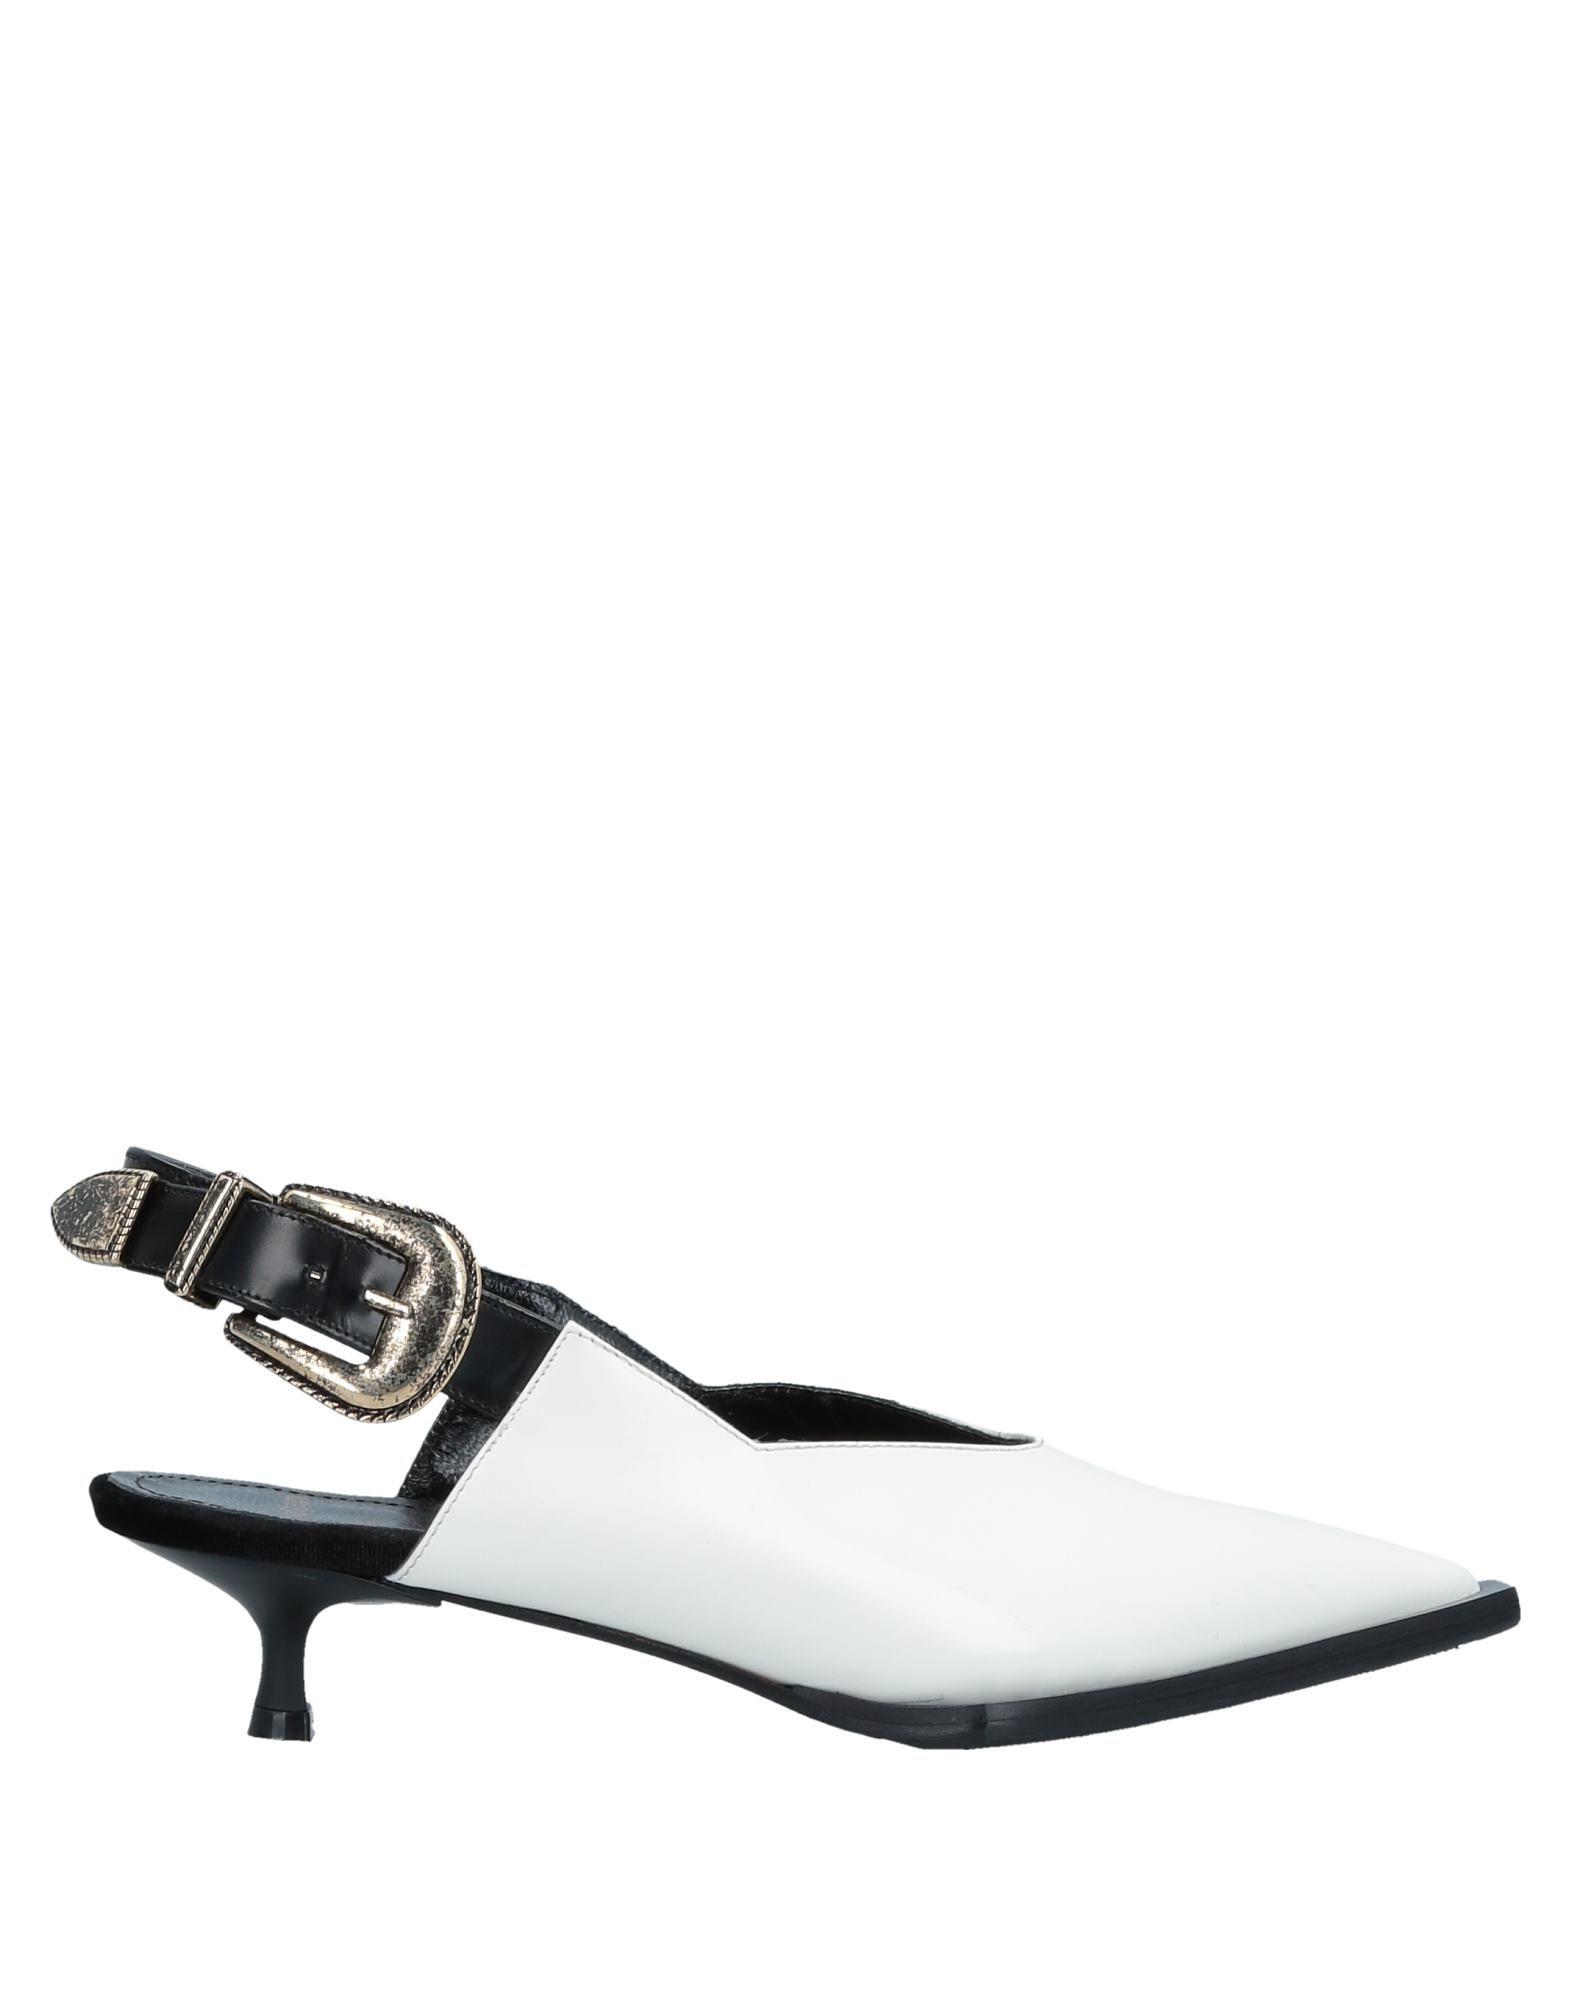 Tipe E Tacchi Pumps Damen   Damen 11519423KF Neue Schuhe 93b470